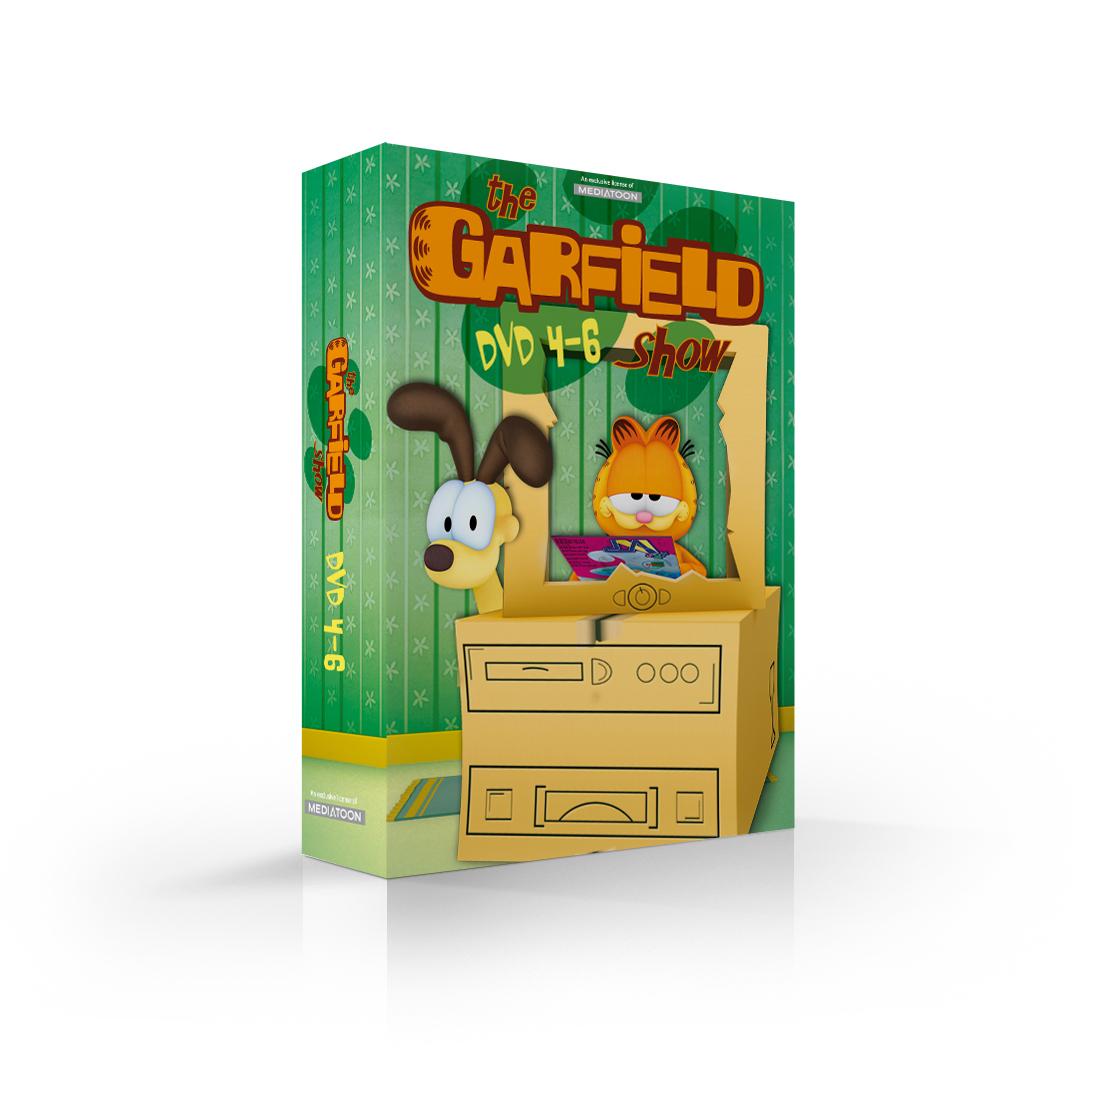 Garfield: kolekce 4-6 (3 DVD) - DVD